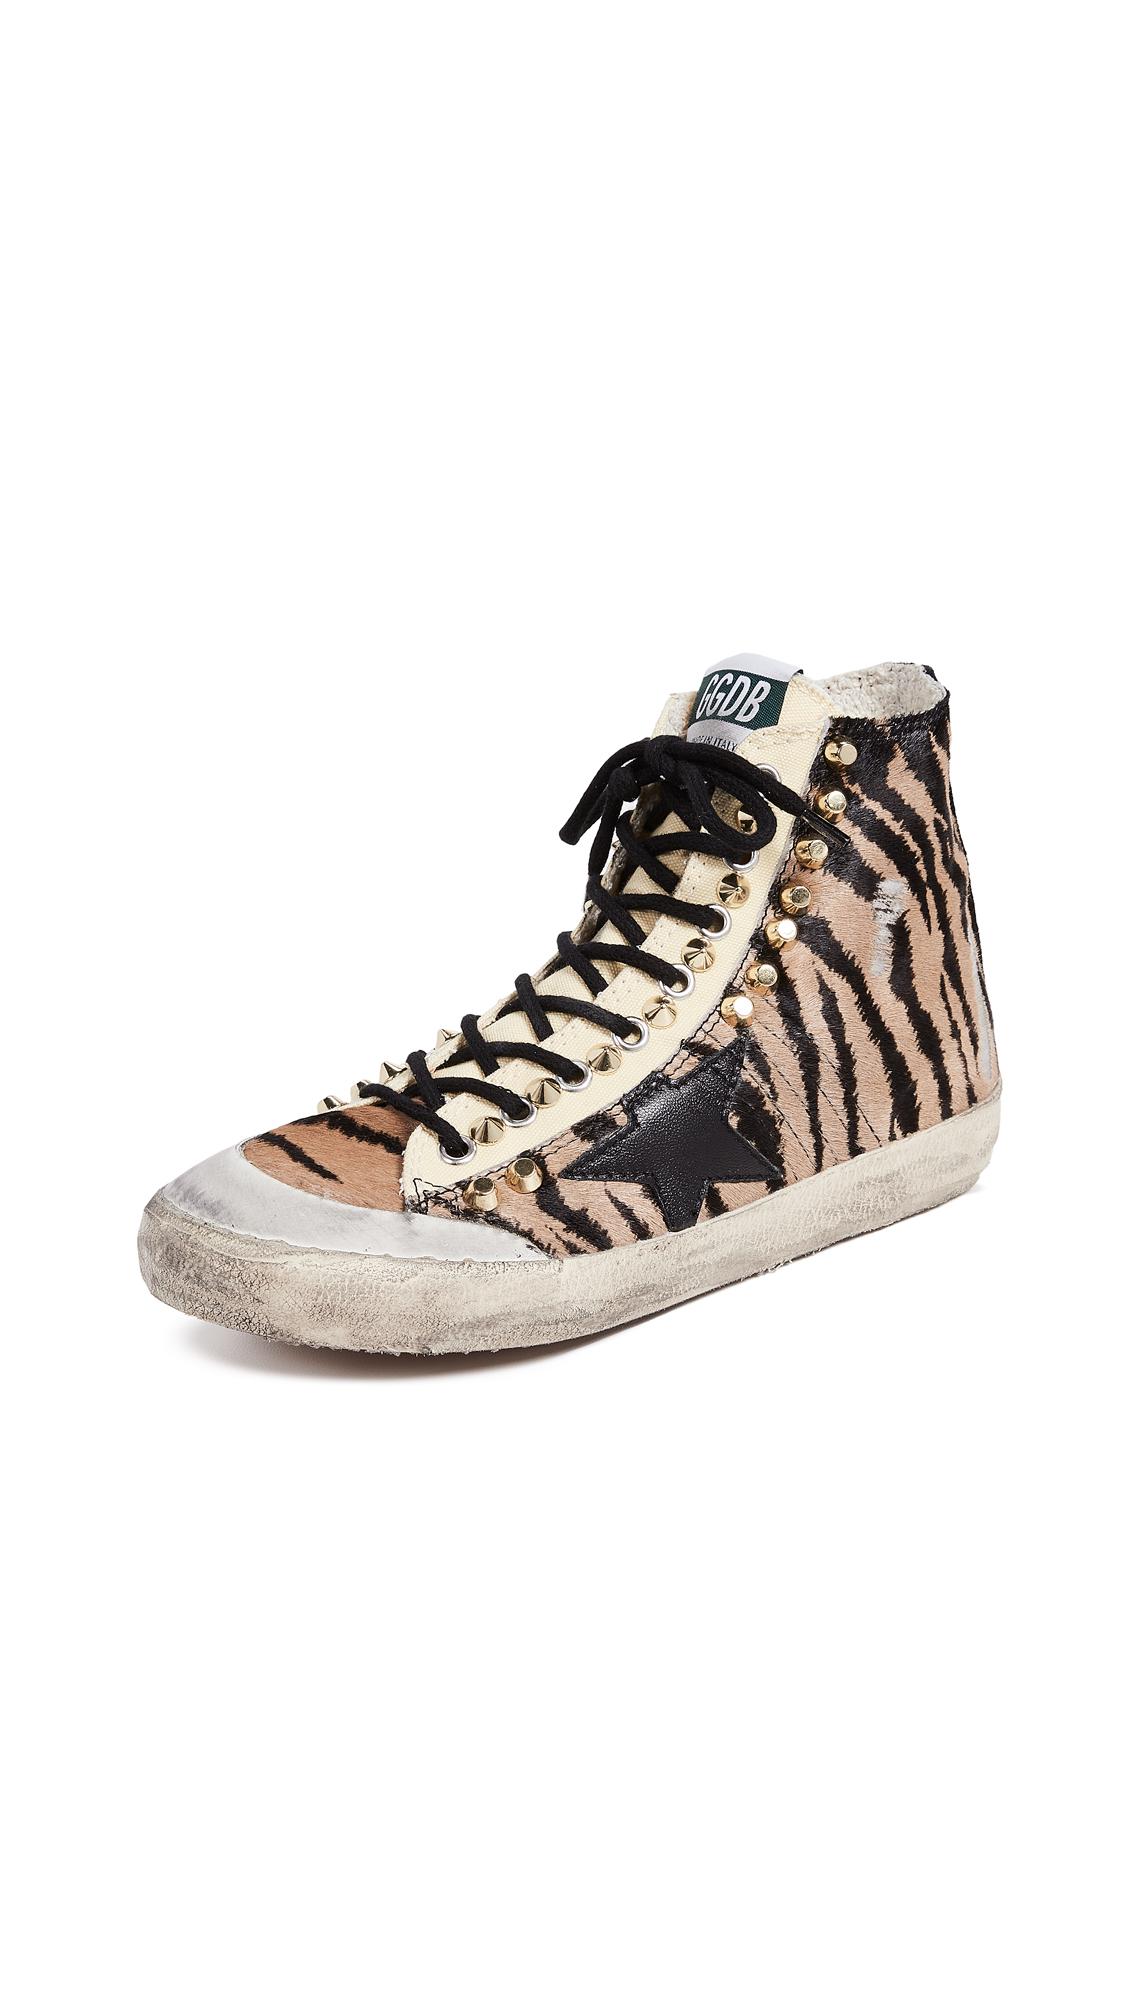 Golden Goose Francy Sneakers - Tiger/Black Penstar